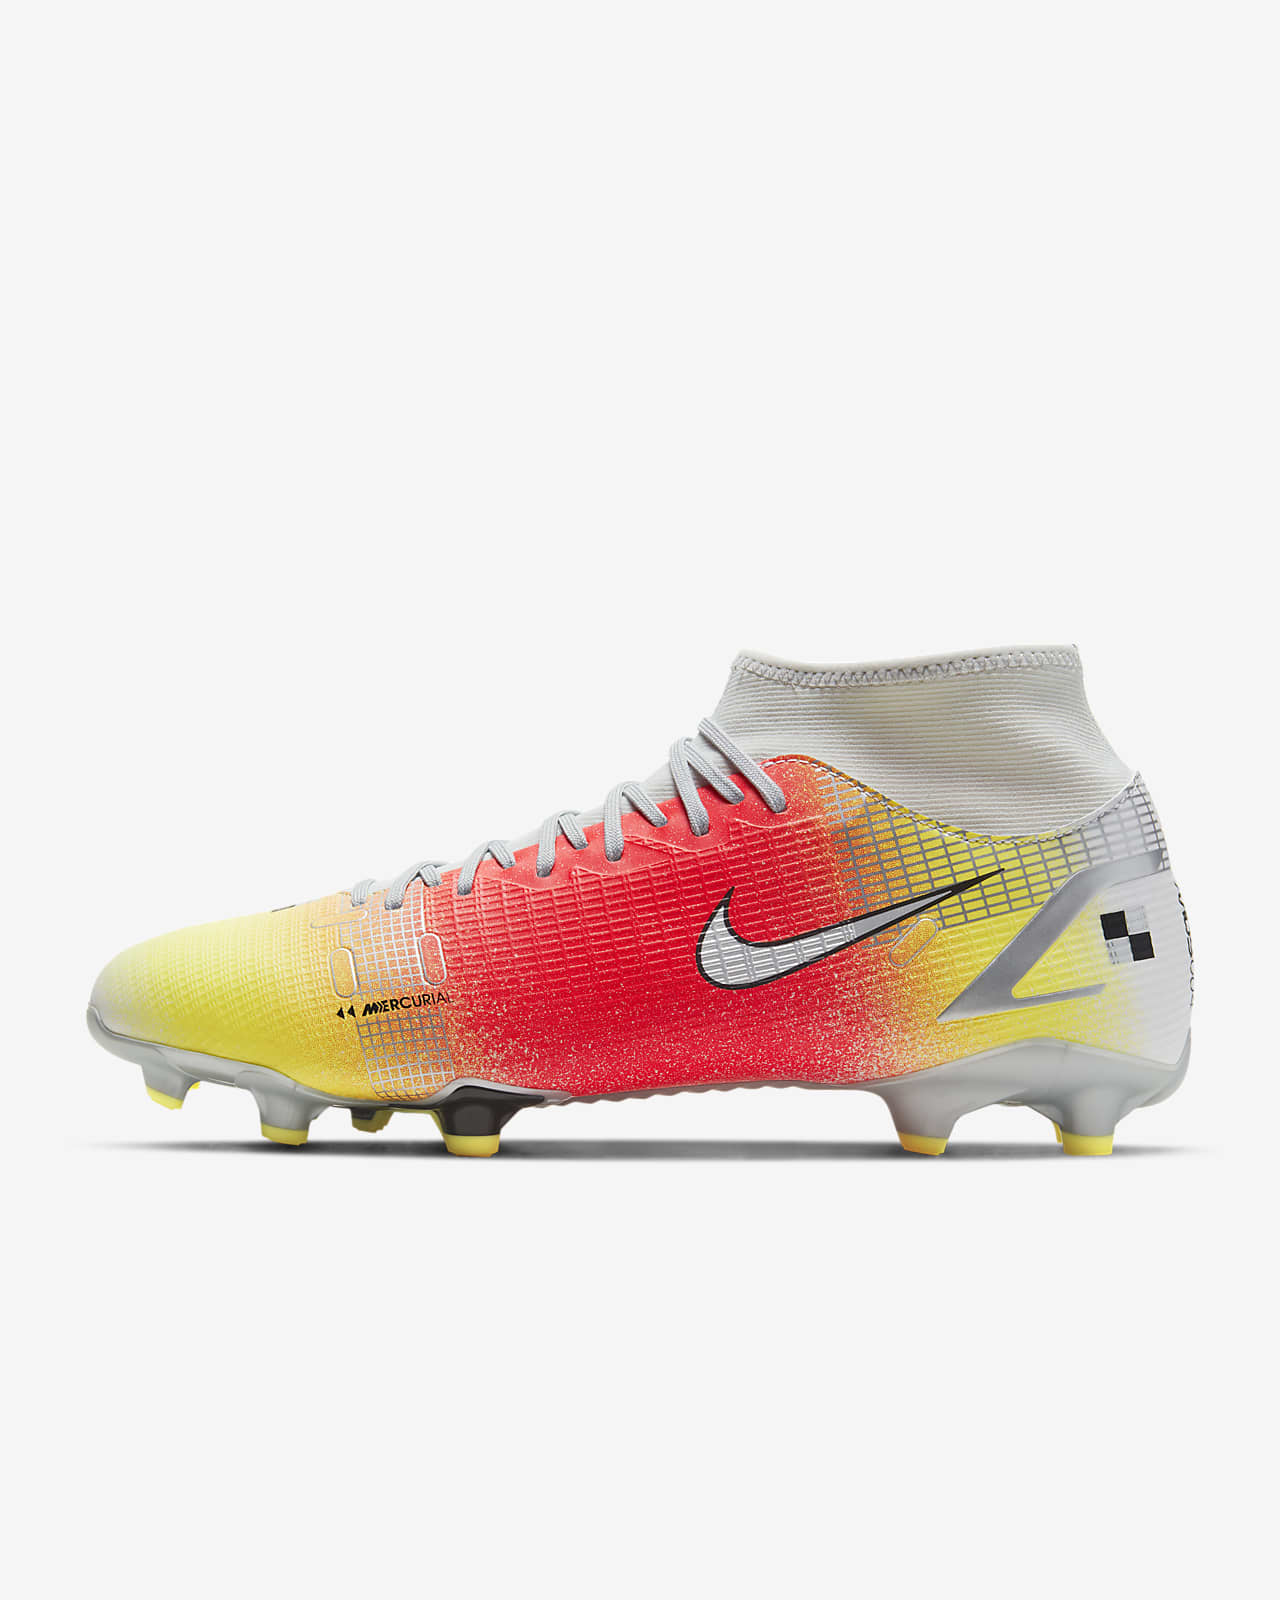 Nike Mercurial Dream Speed Superfly 8 Academy MG Botas de fútbol para múltiples superficies